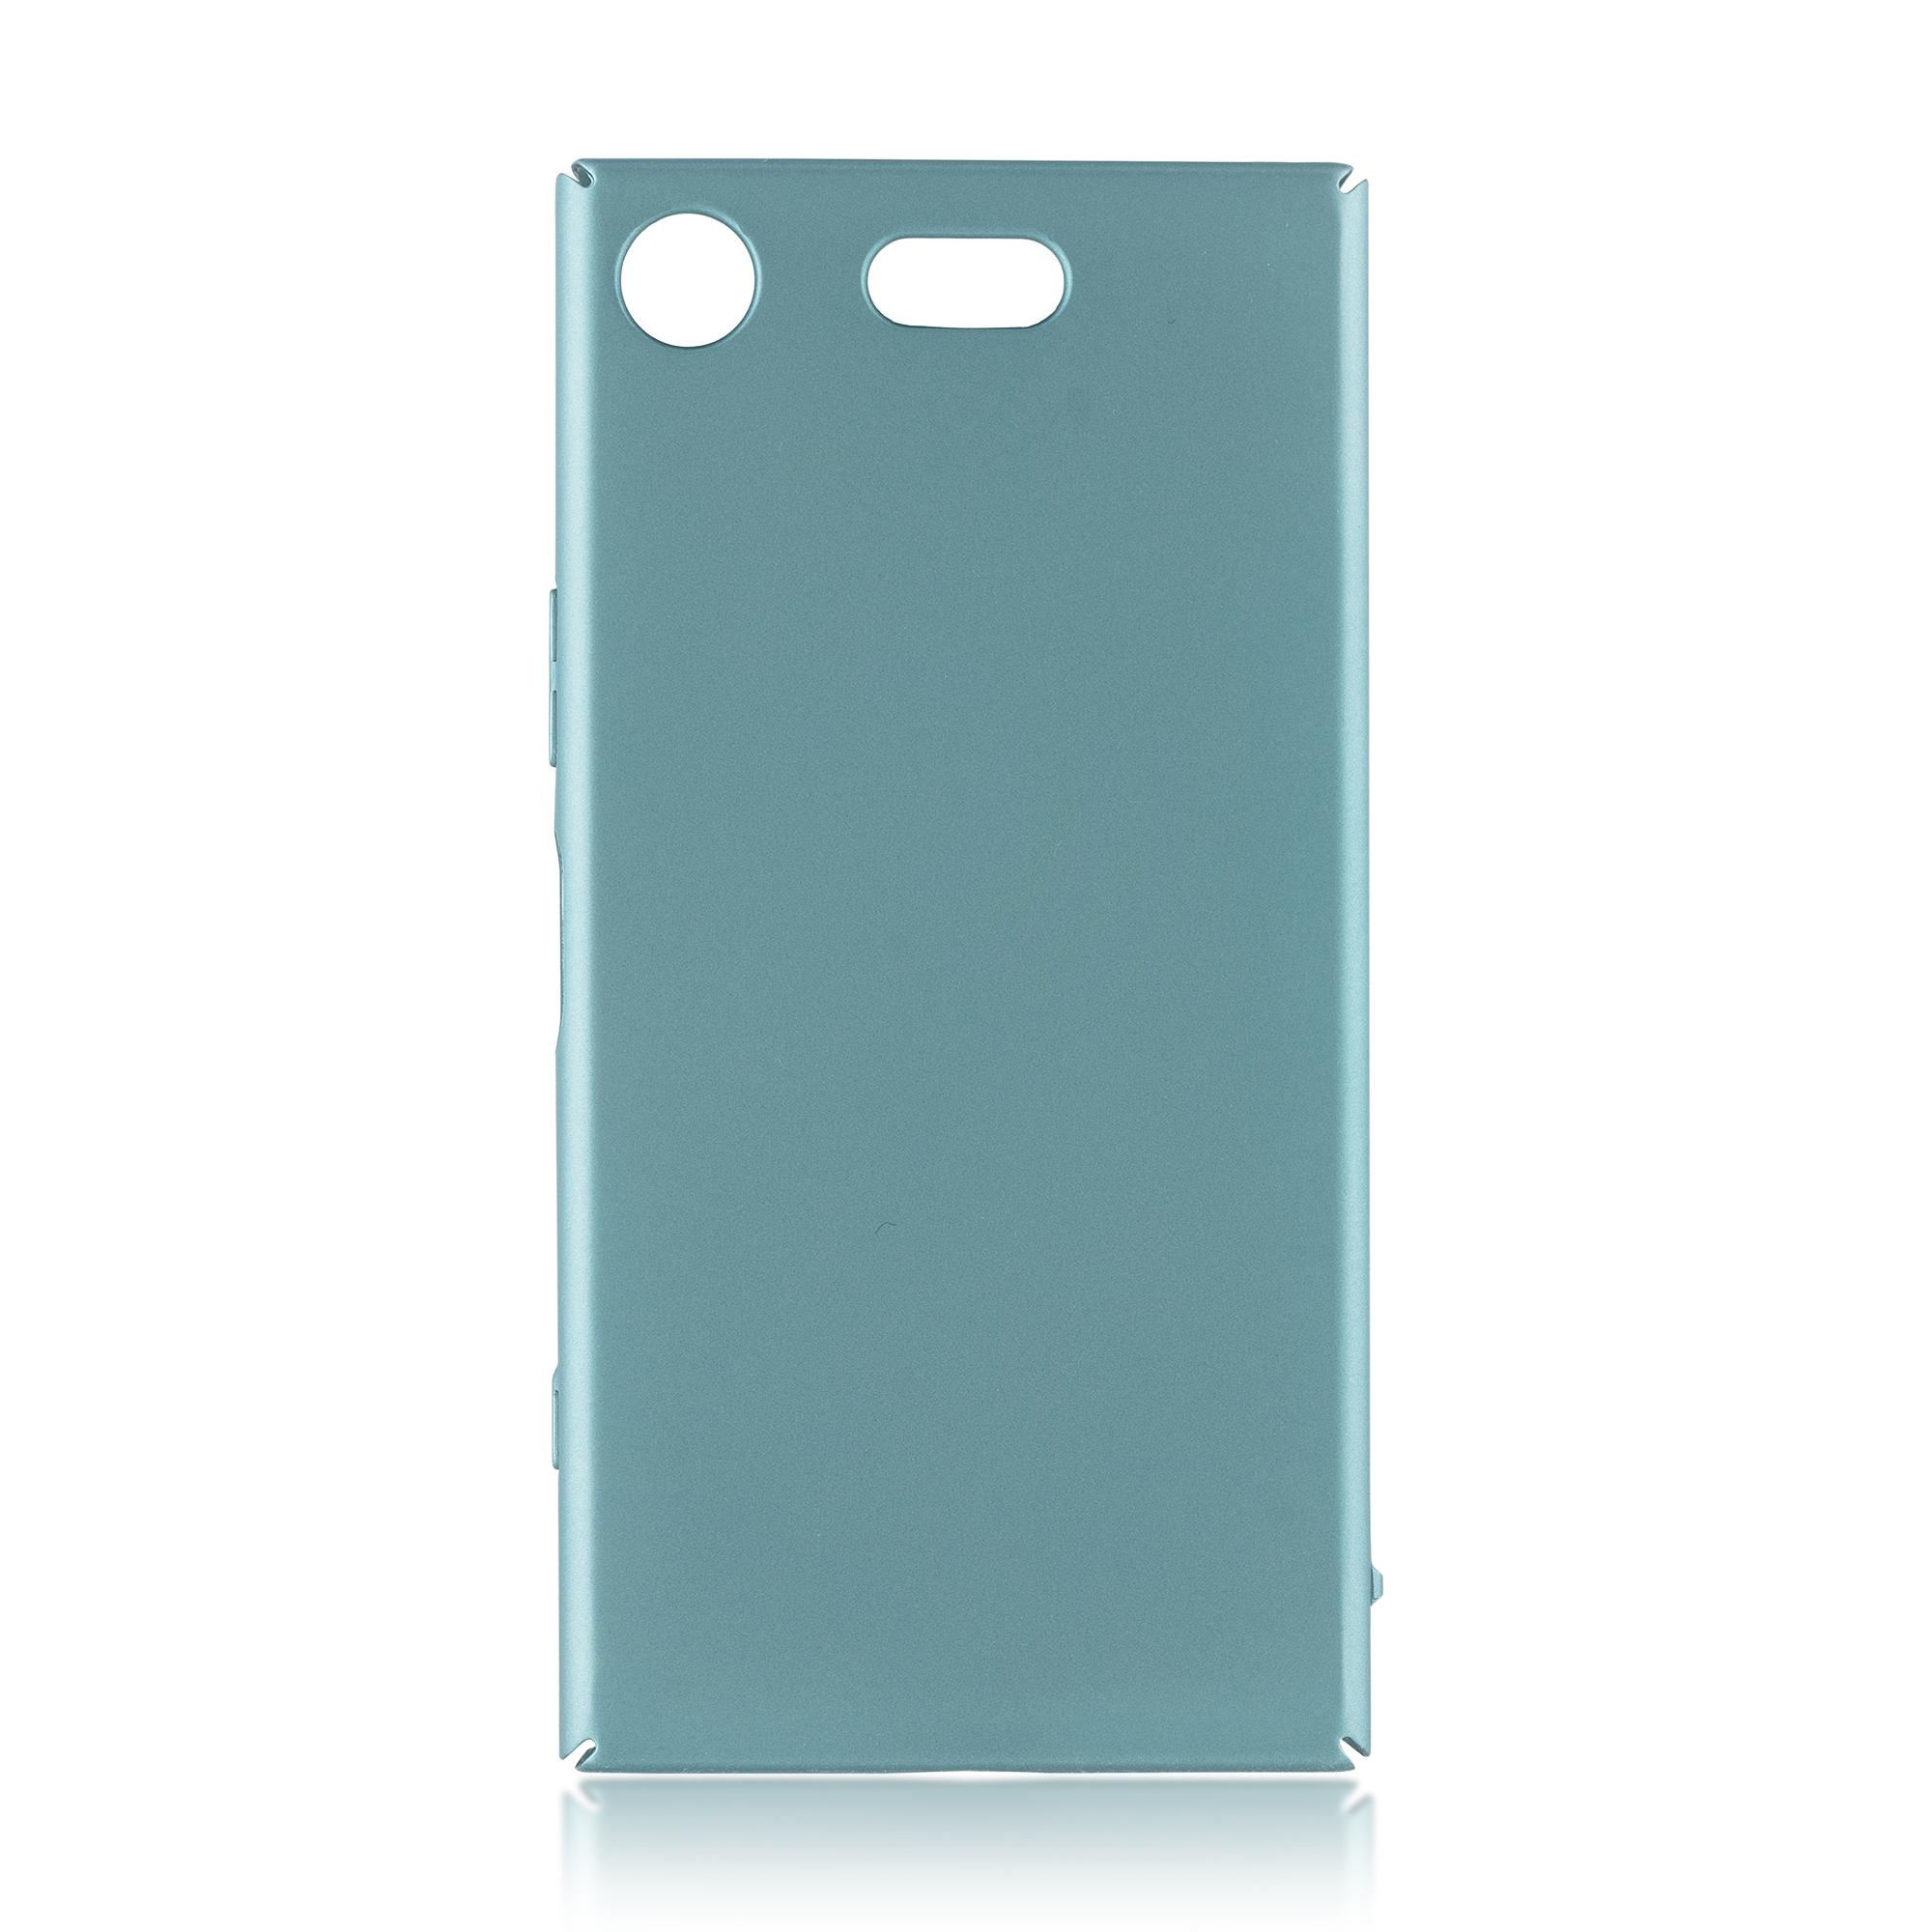 Накладка Brosco Soft-touch для Sony Xperia XZ1 Compact, синяя